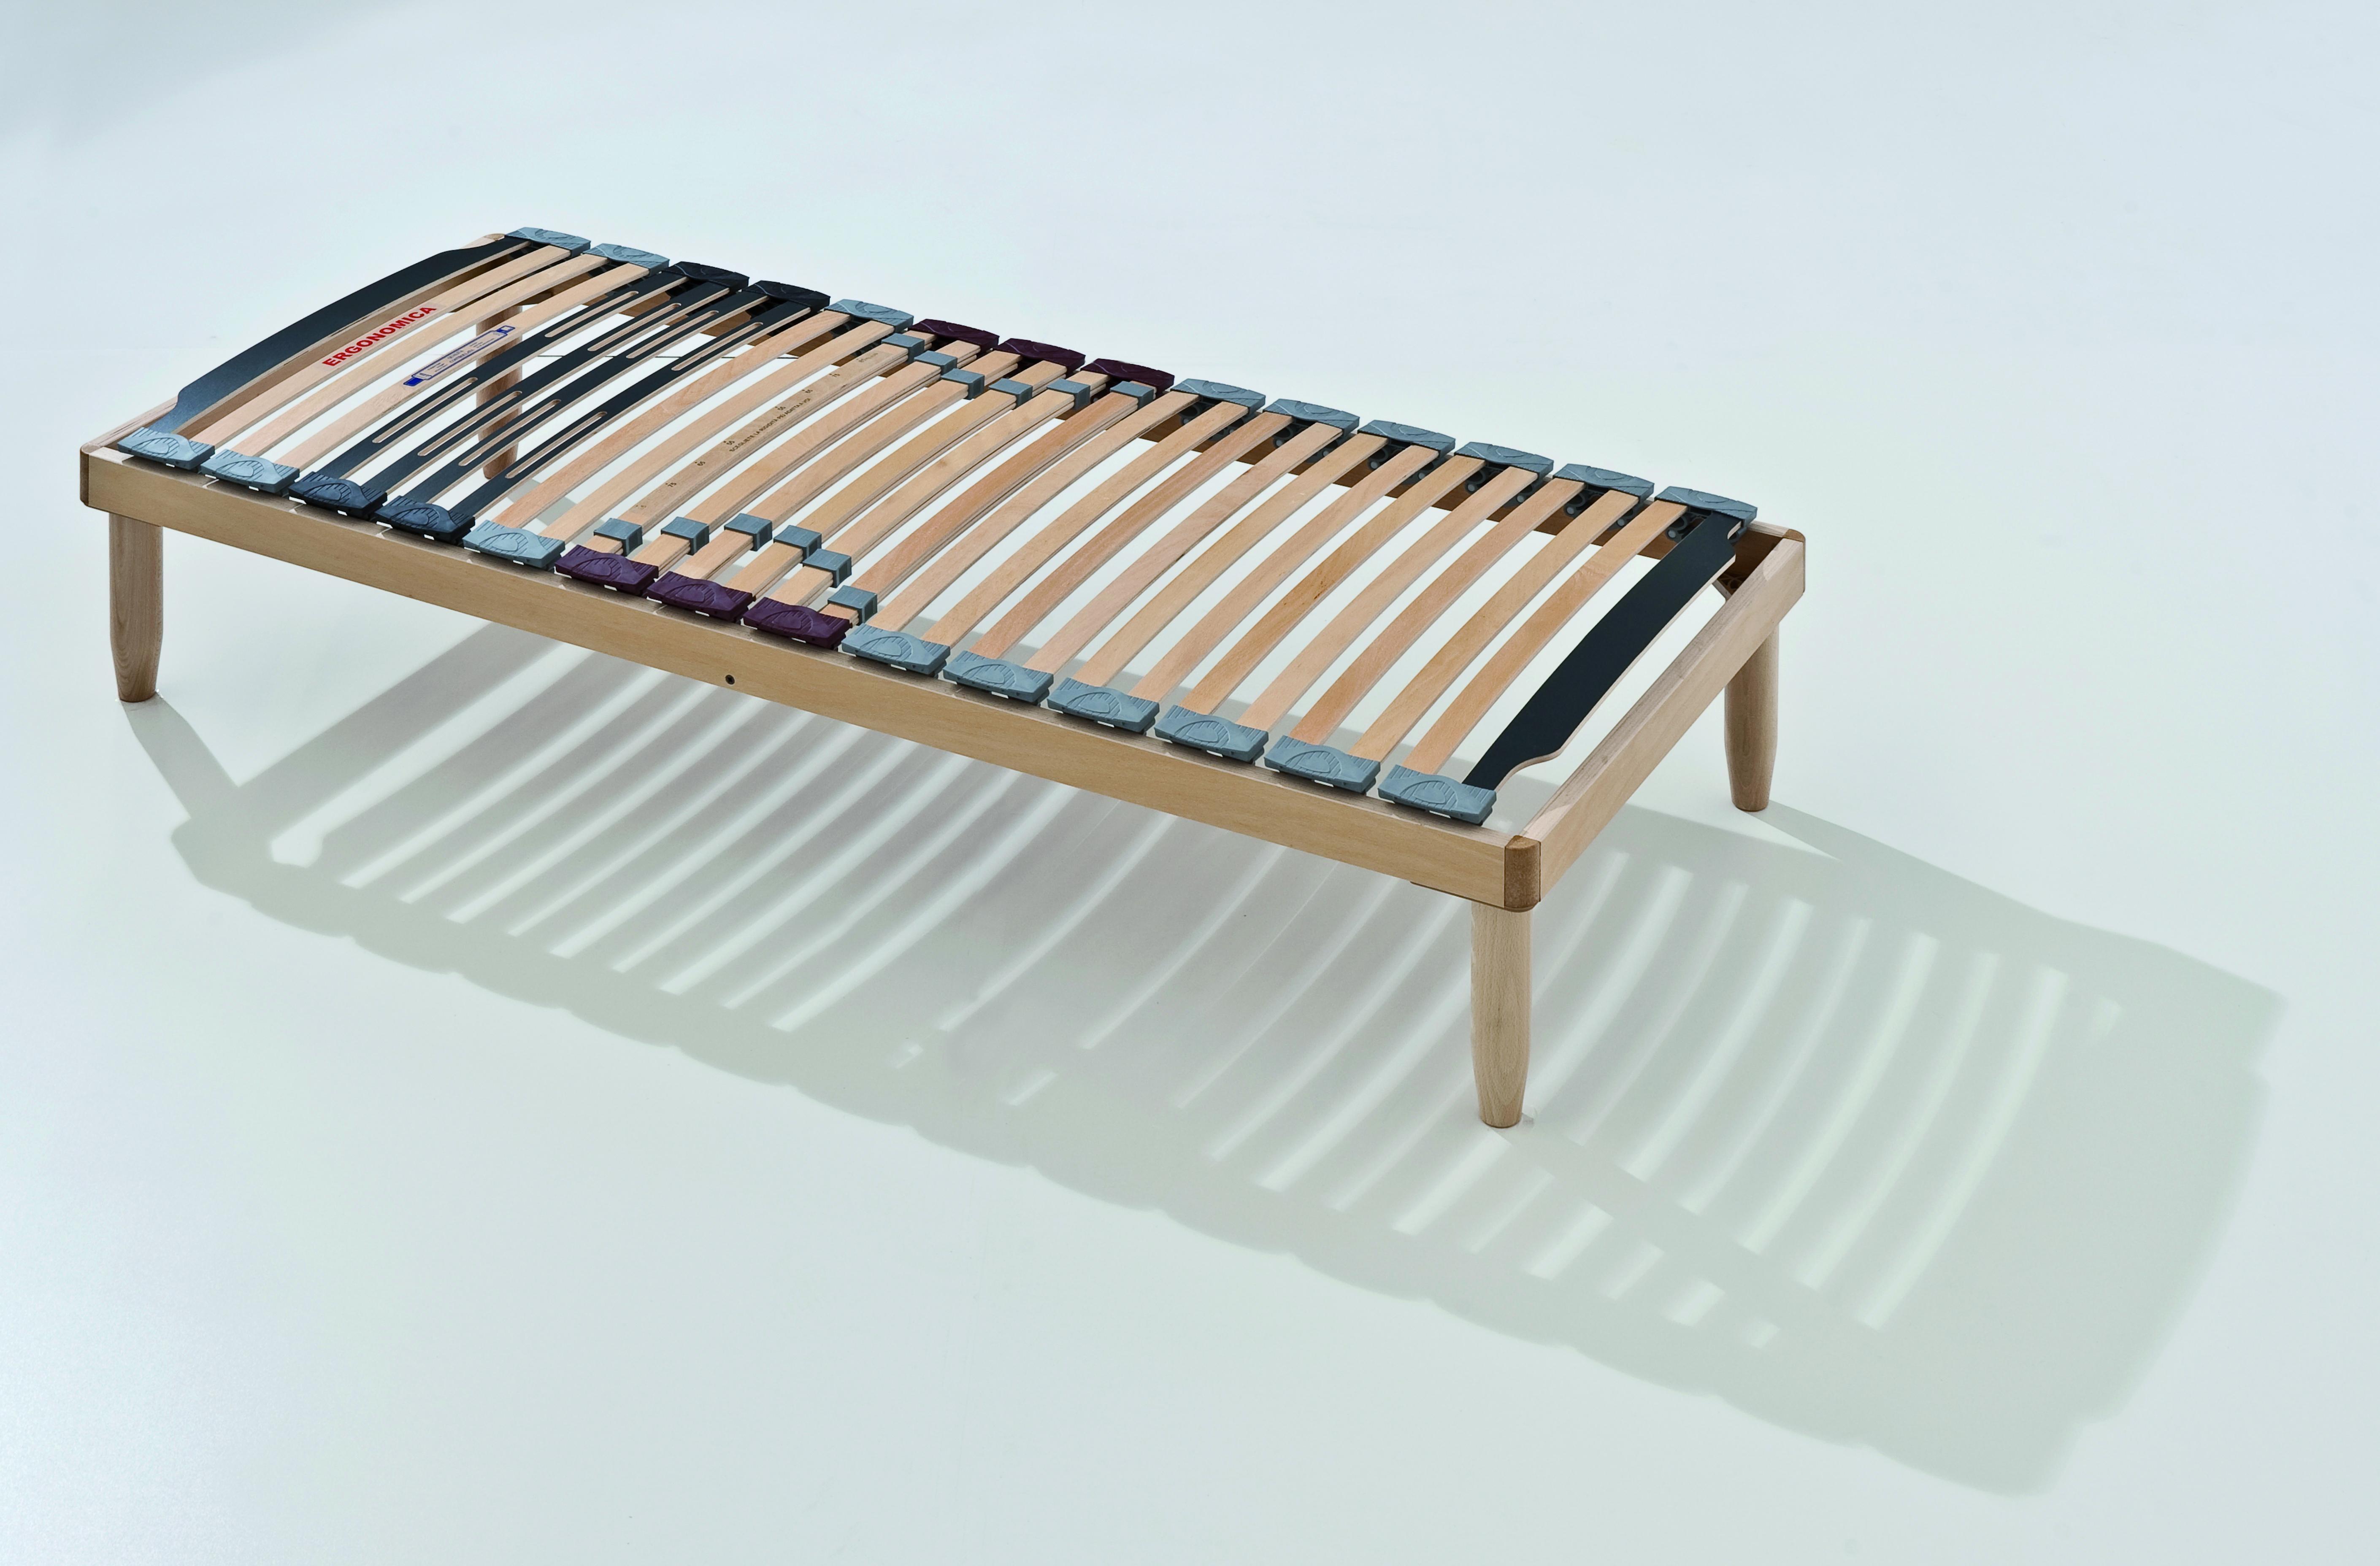 stabiler holz lattenrost mit 28 federholzleisten. Black Bedroom Furniture Sets. Home Design Ideas